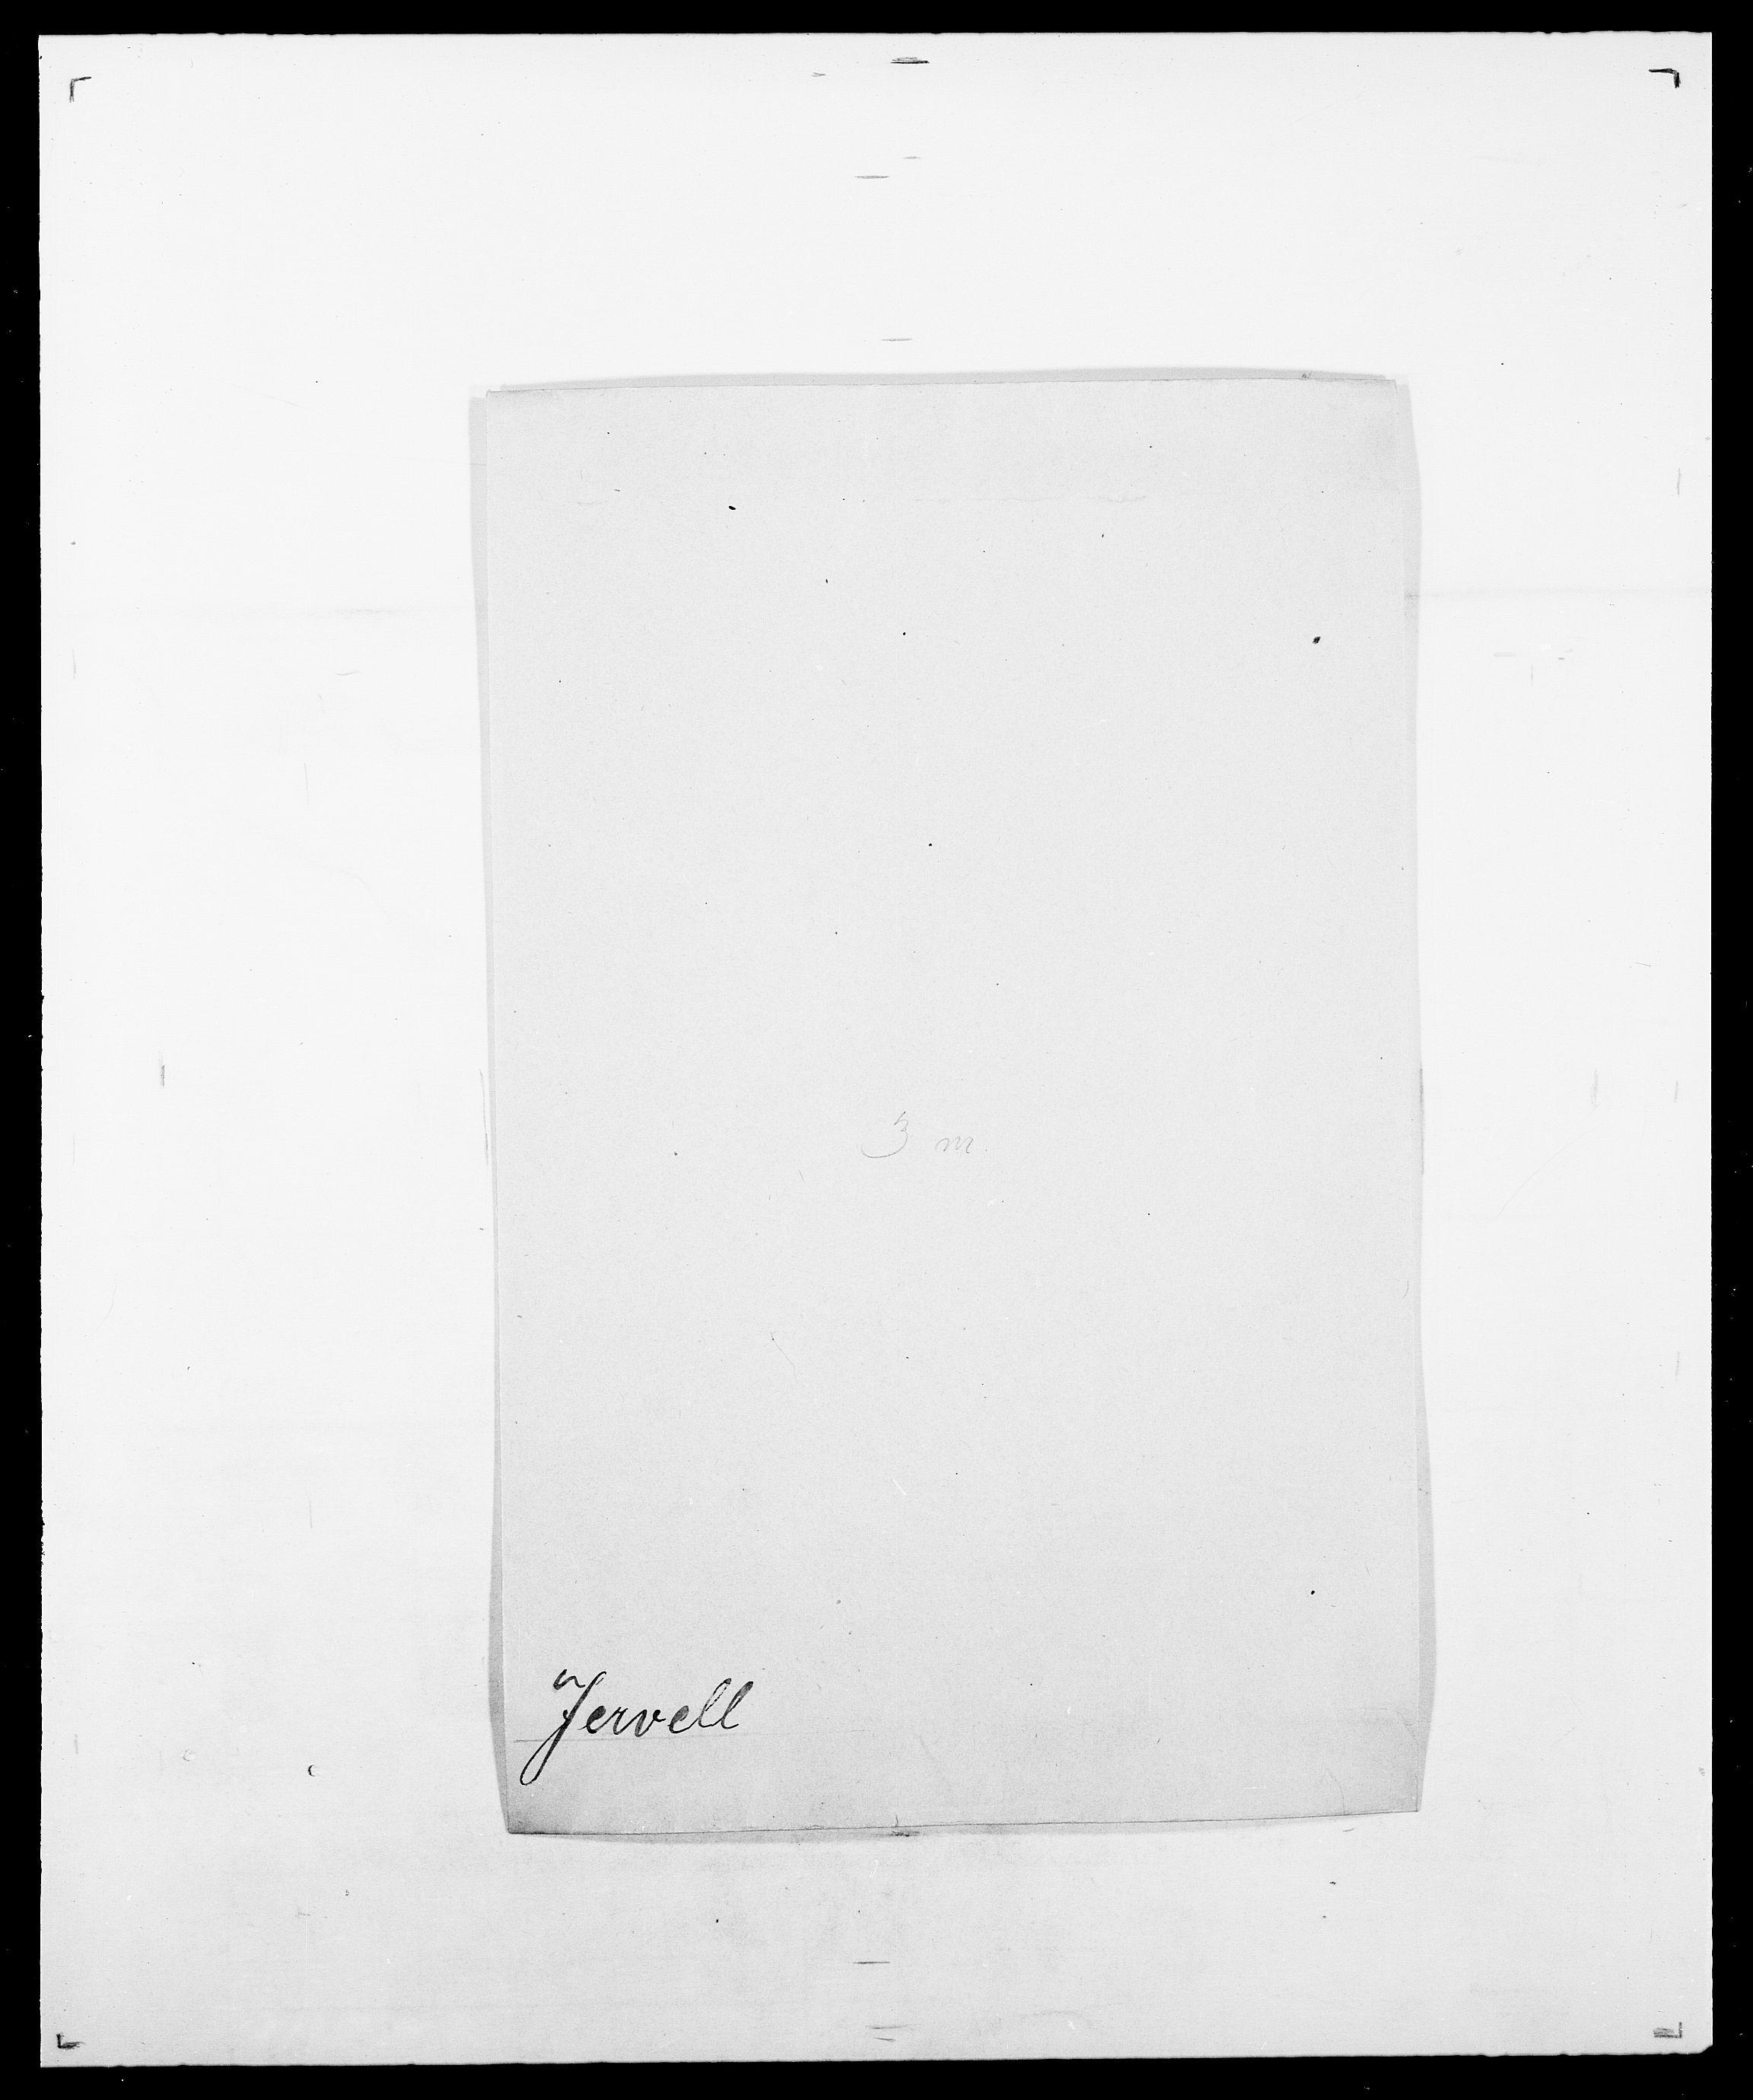 SAO, Delgobe, Charles Antoine - samling, D/Da/L0019: van der Hude - Joys, s. 715